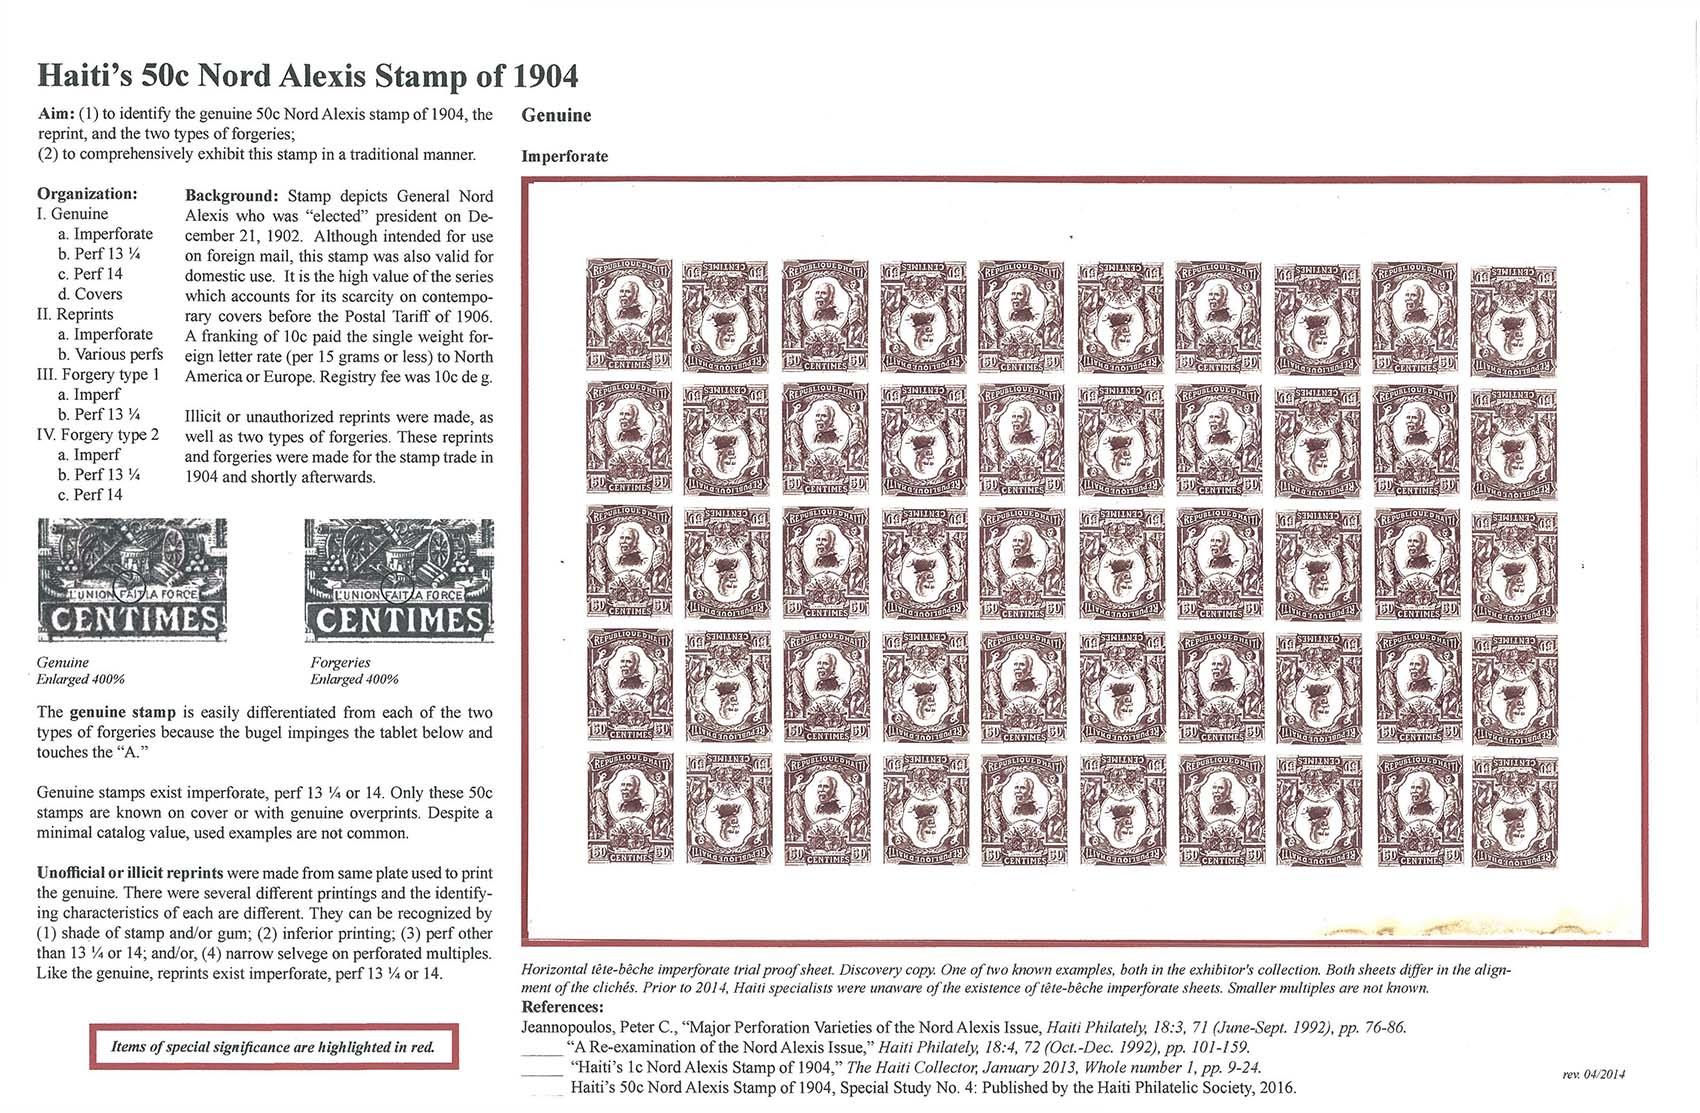 american association of philatelic exhibitors exhibits online